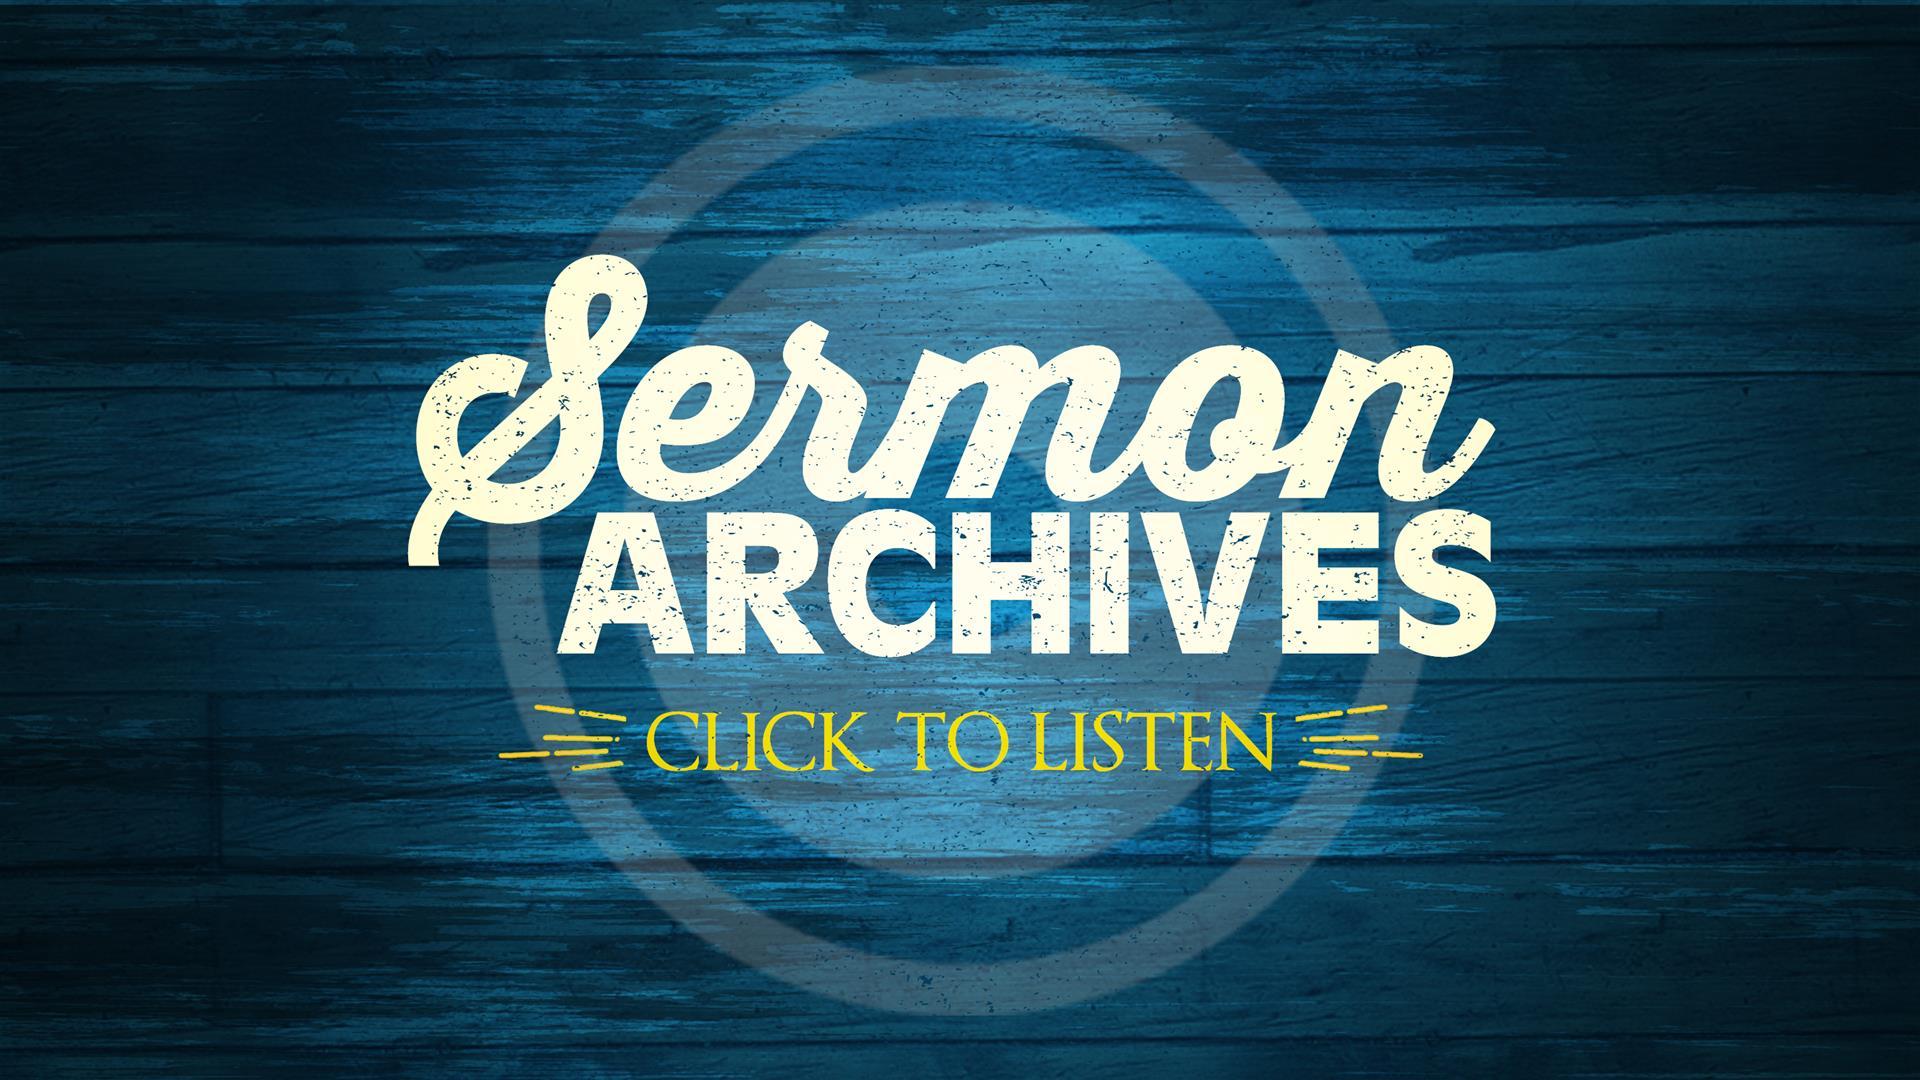 sermonarchives